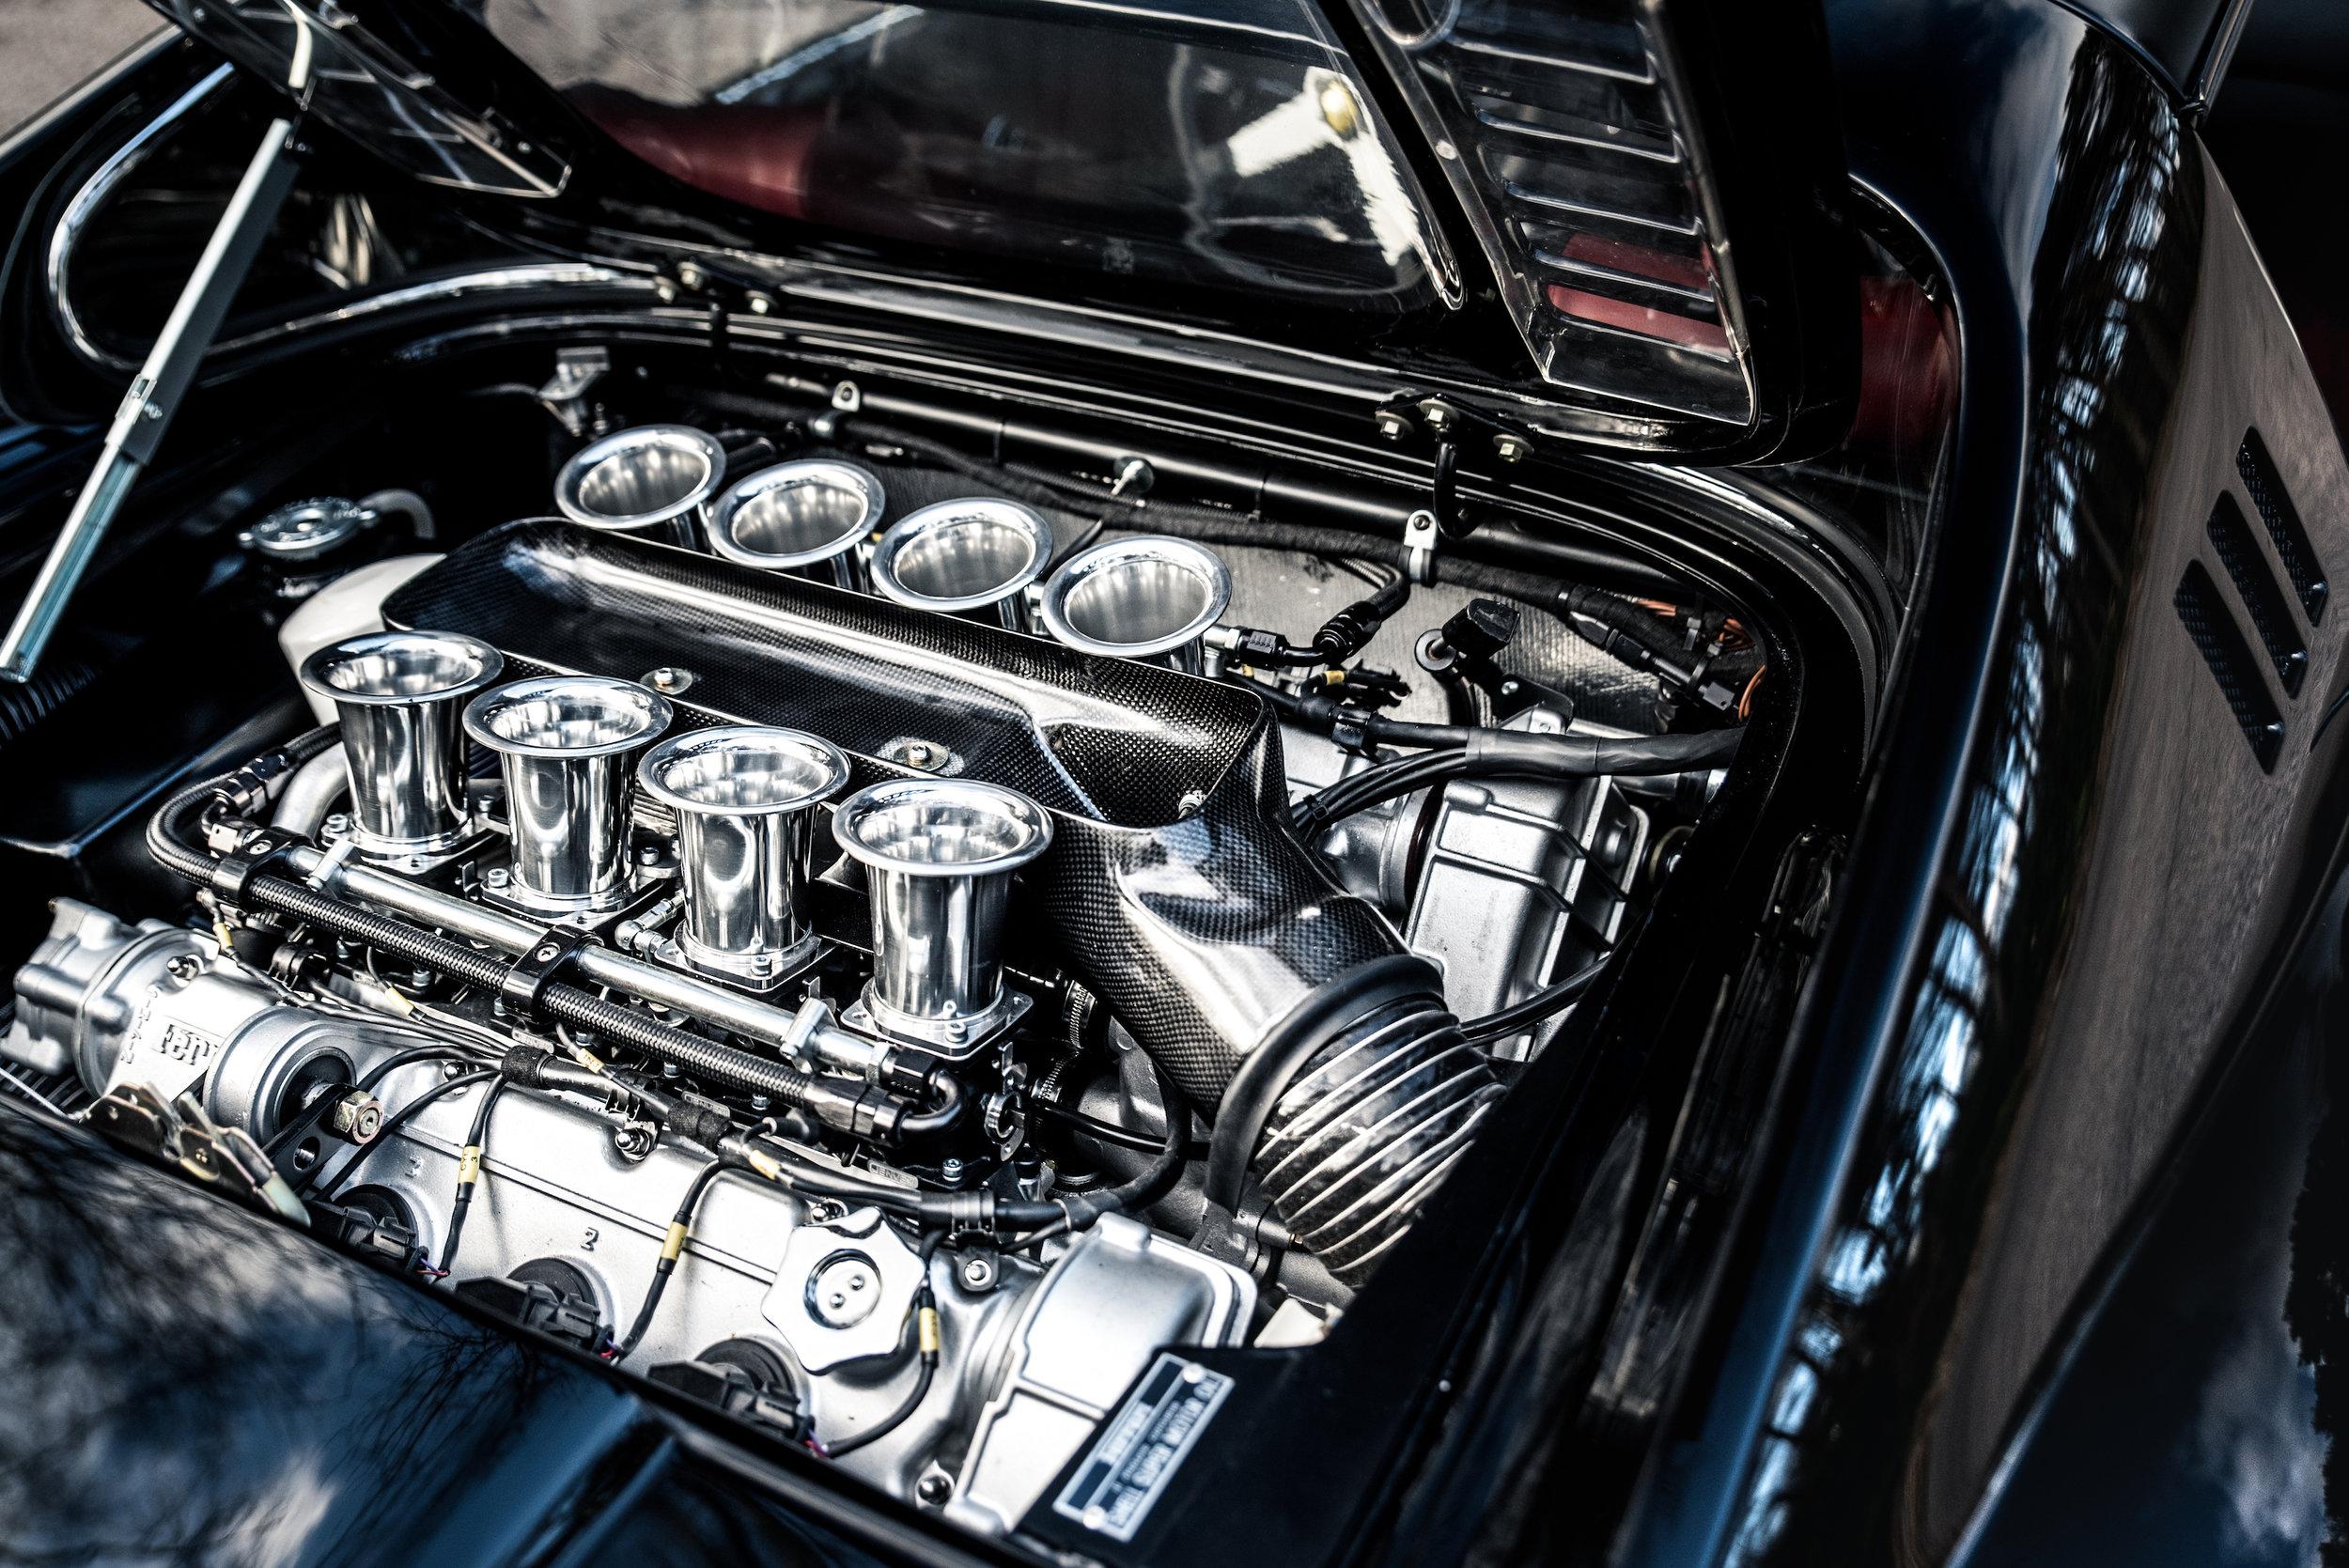 Dino 26 Engine CU Cover up.jpg